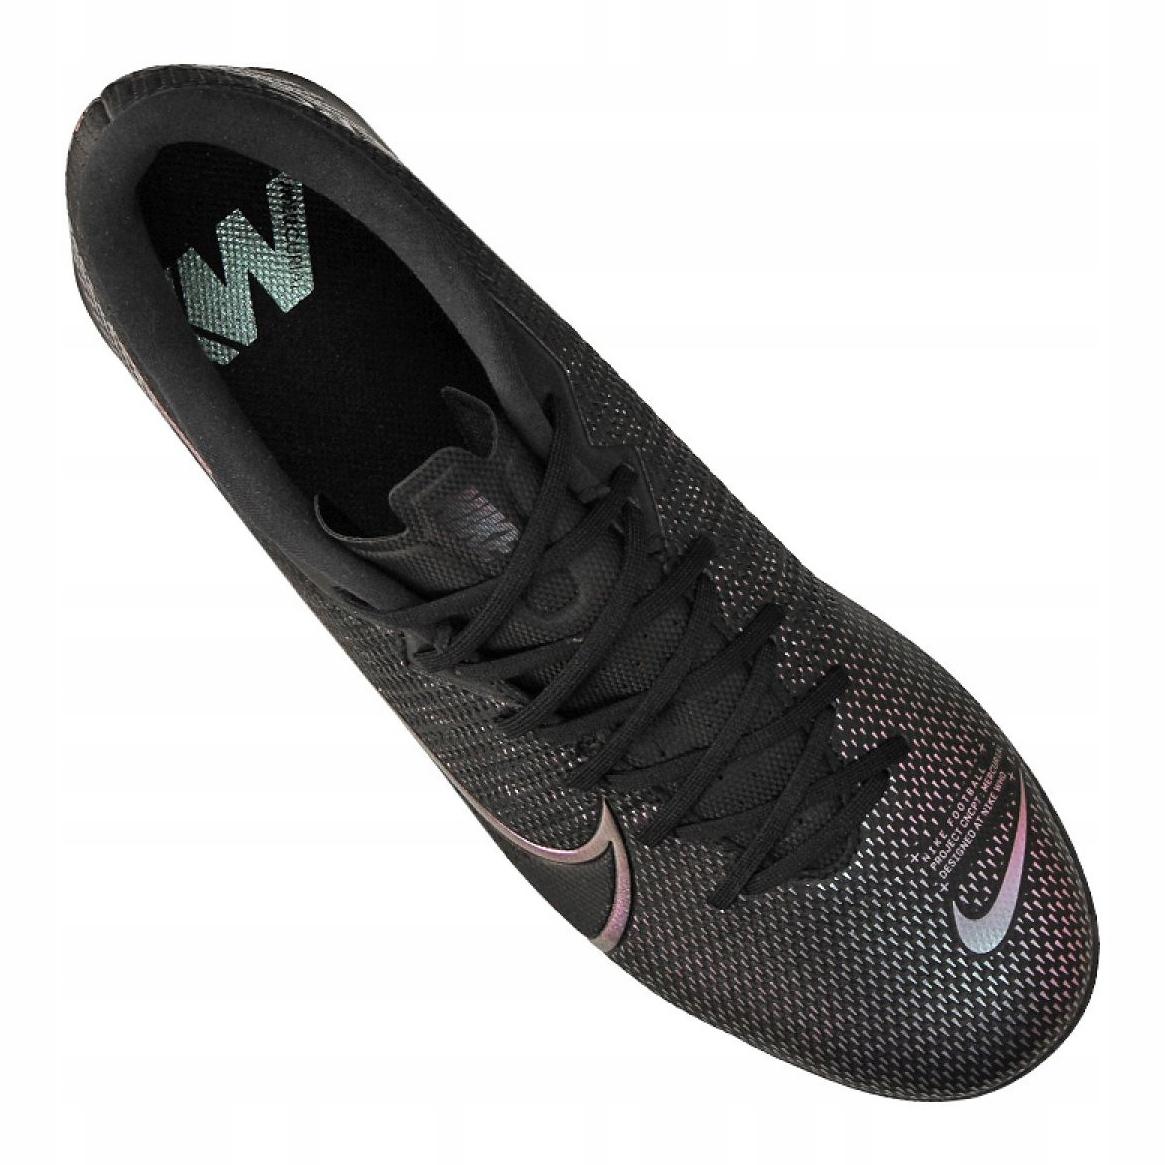 Buty Nike Vapor 13 Academy Ic M AT7993 010 r.44,5